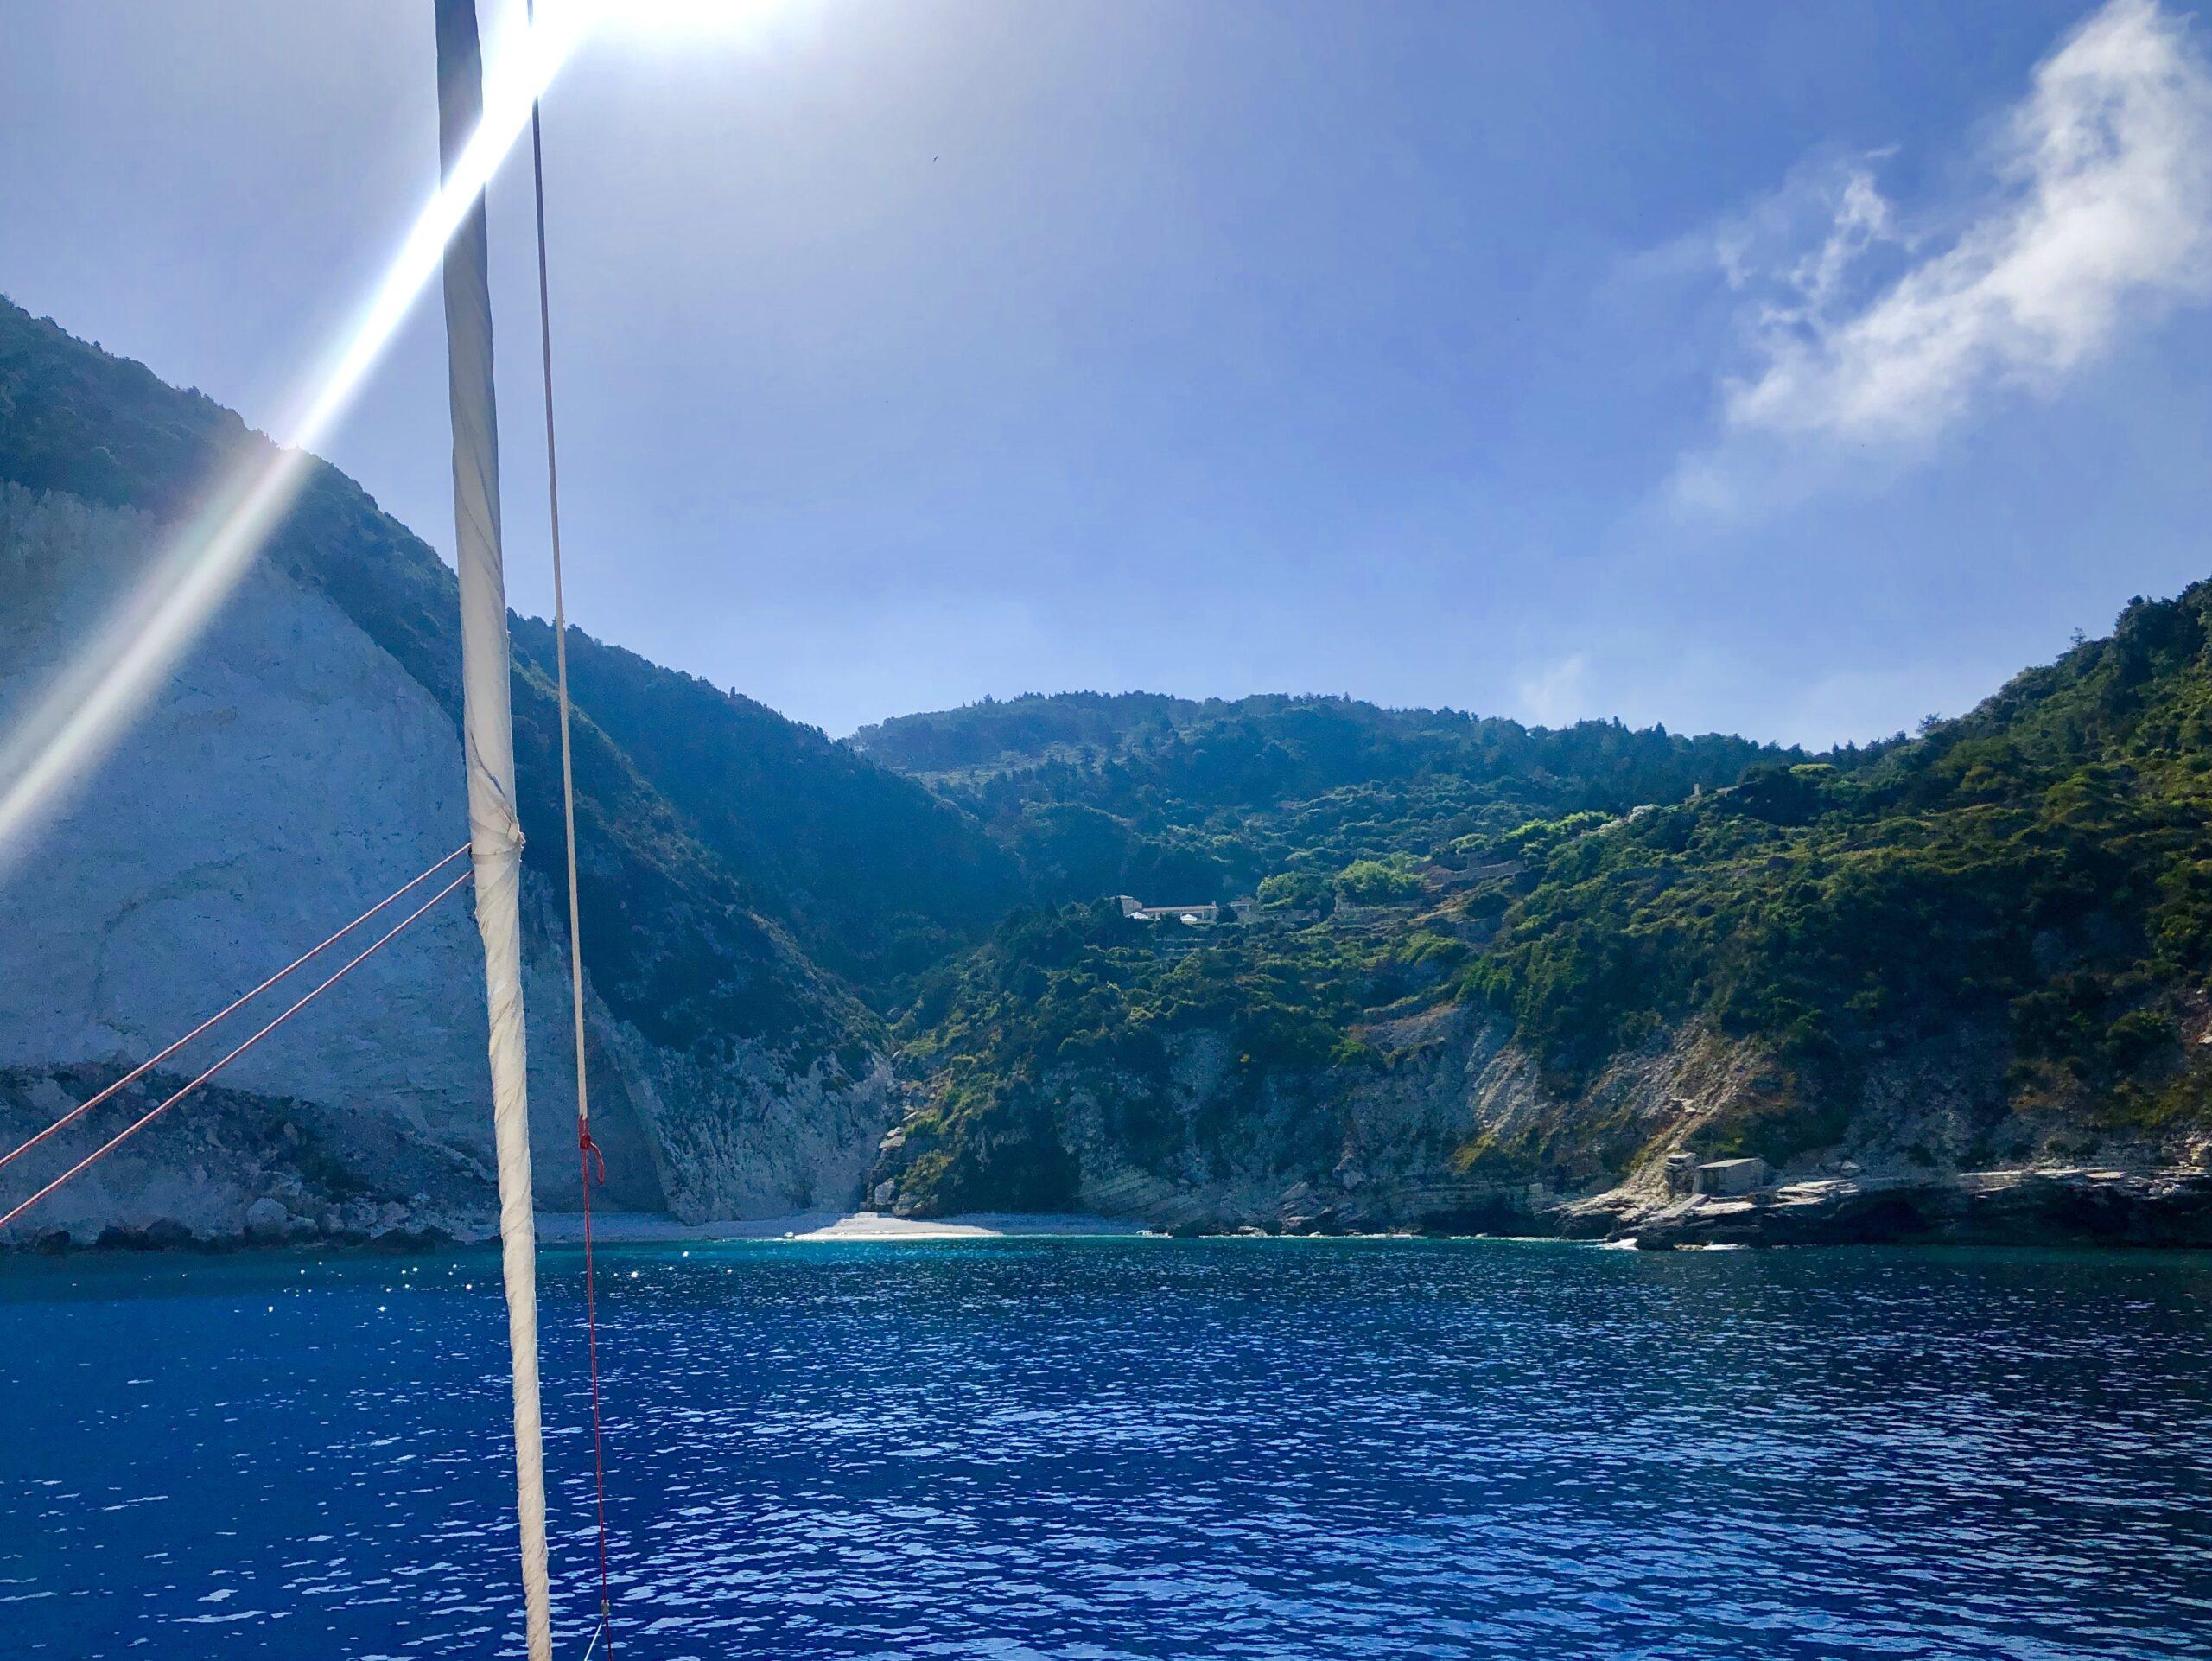 A beach seen from the boat of a catamaran